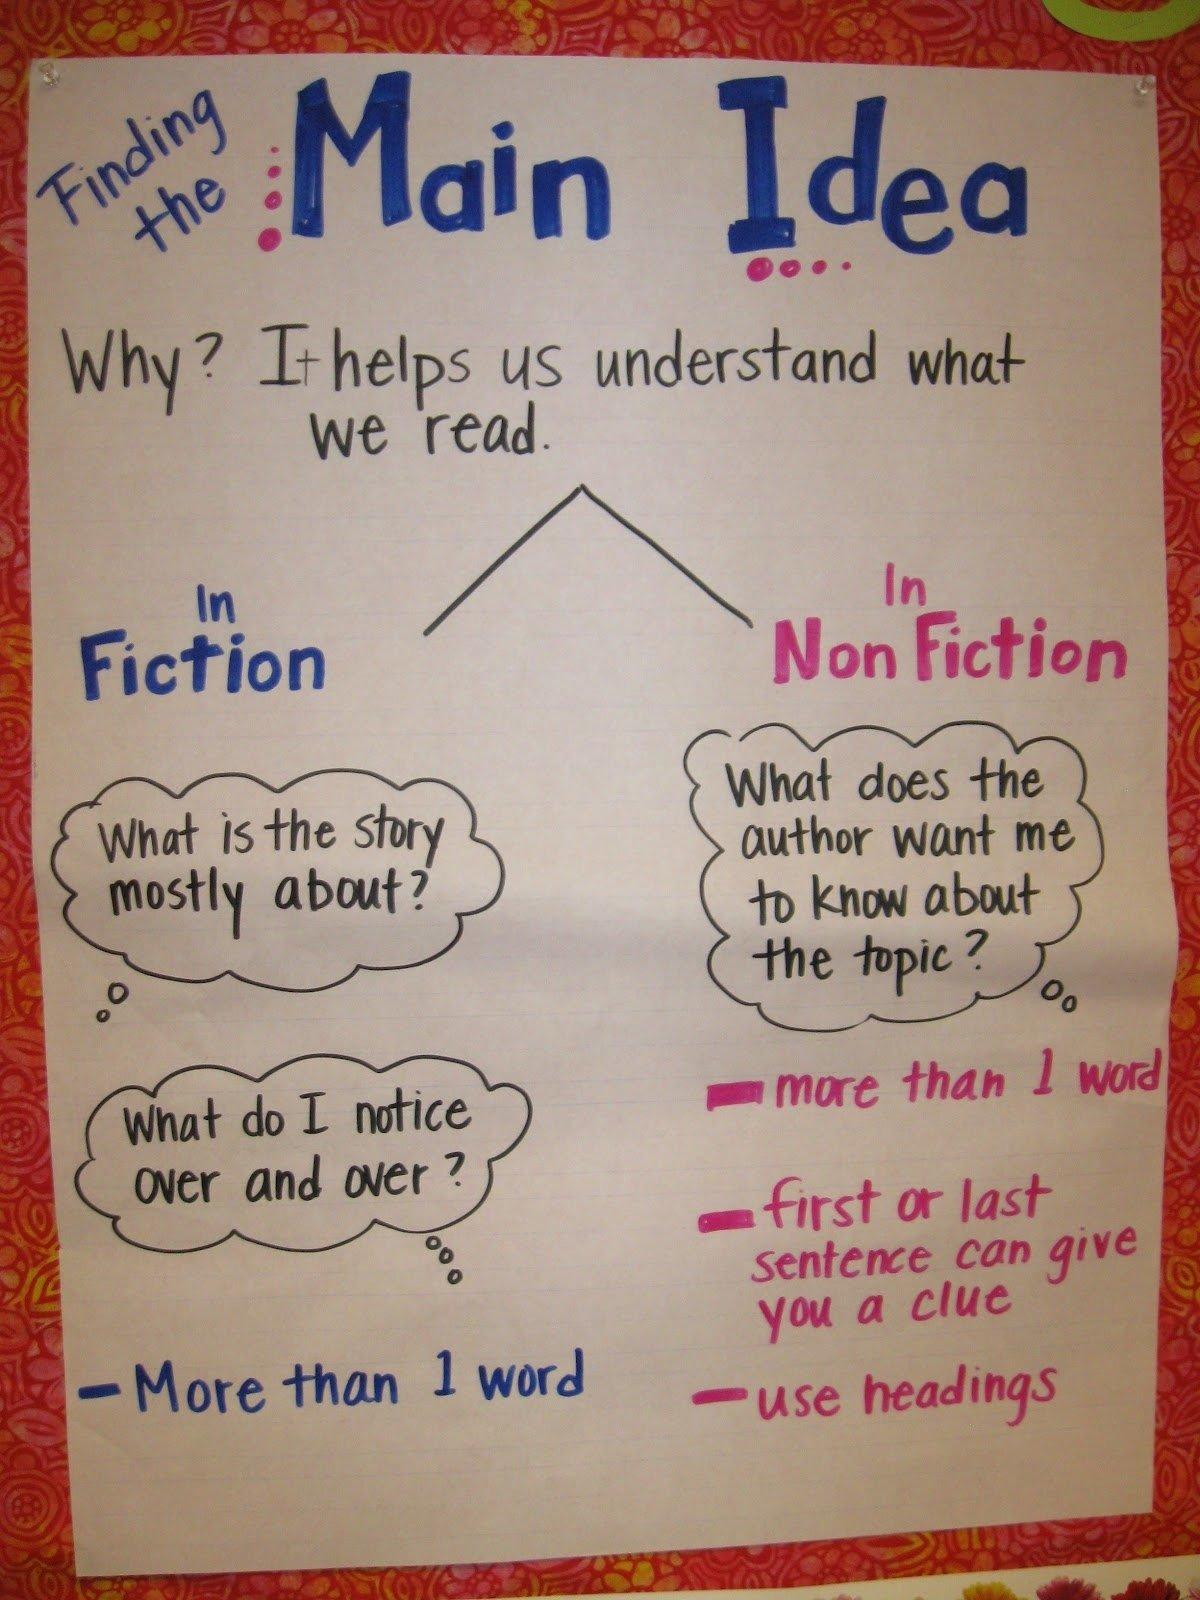 10 Cute What Is The Main Idea Of A Book mrs brauns 2nd grade class september 2012 2021